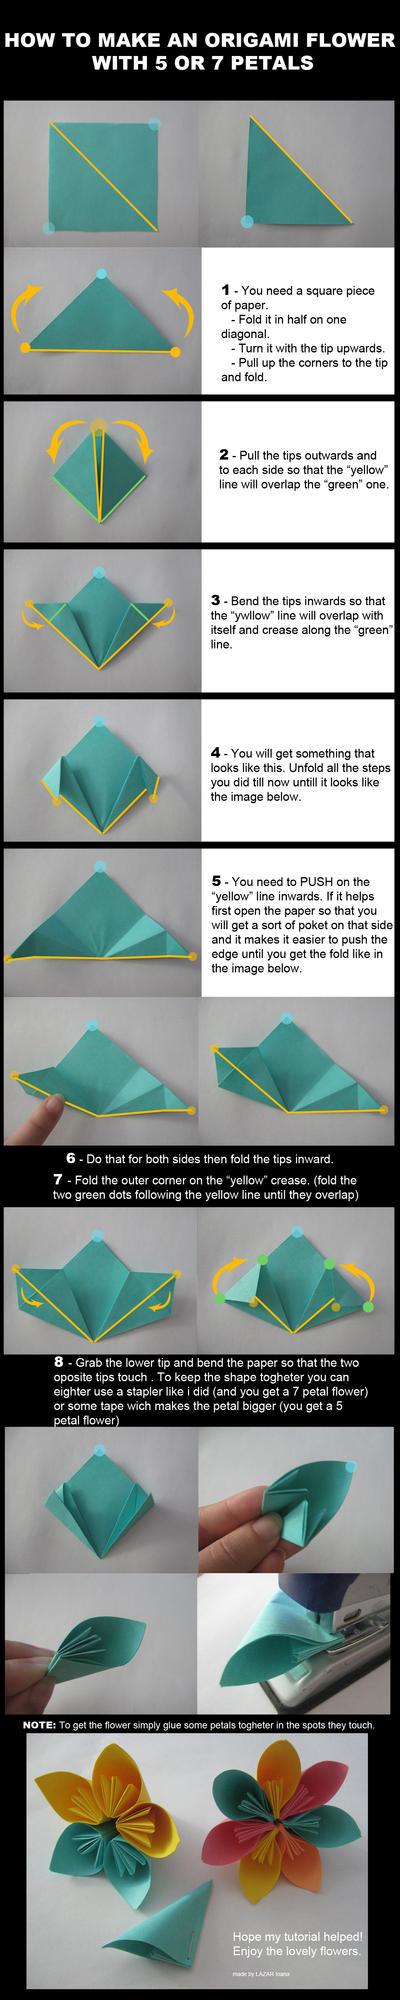 Origami Flower Tutorial By Darkumah On Deviantart